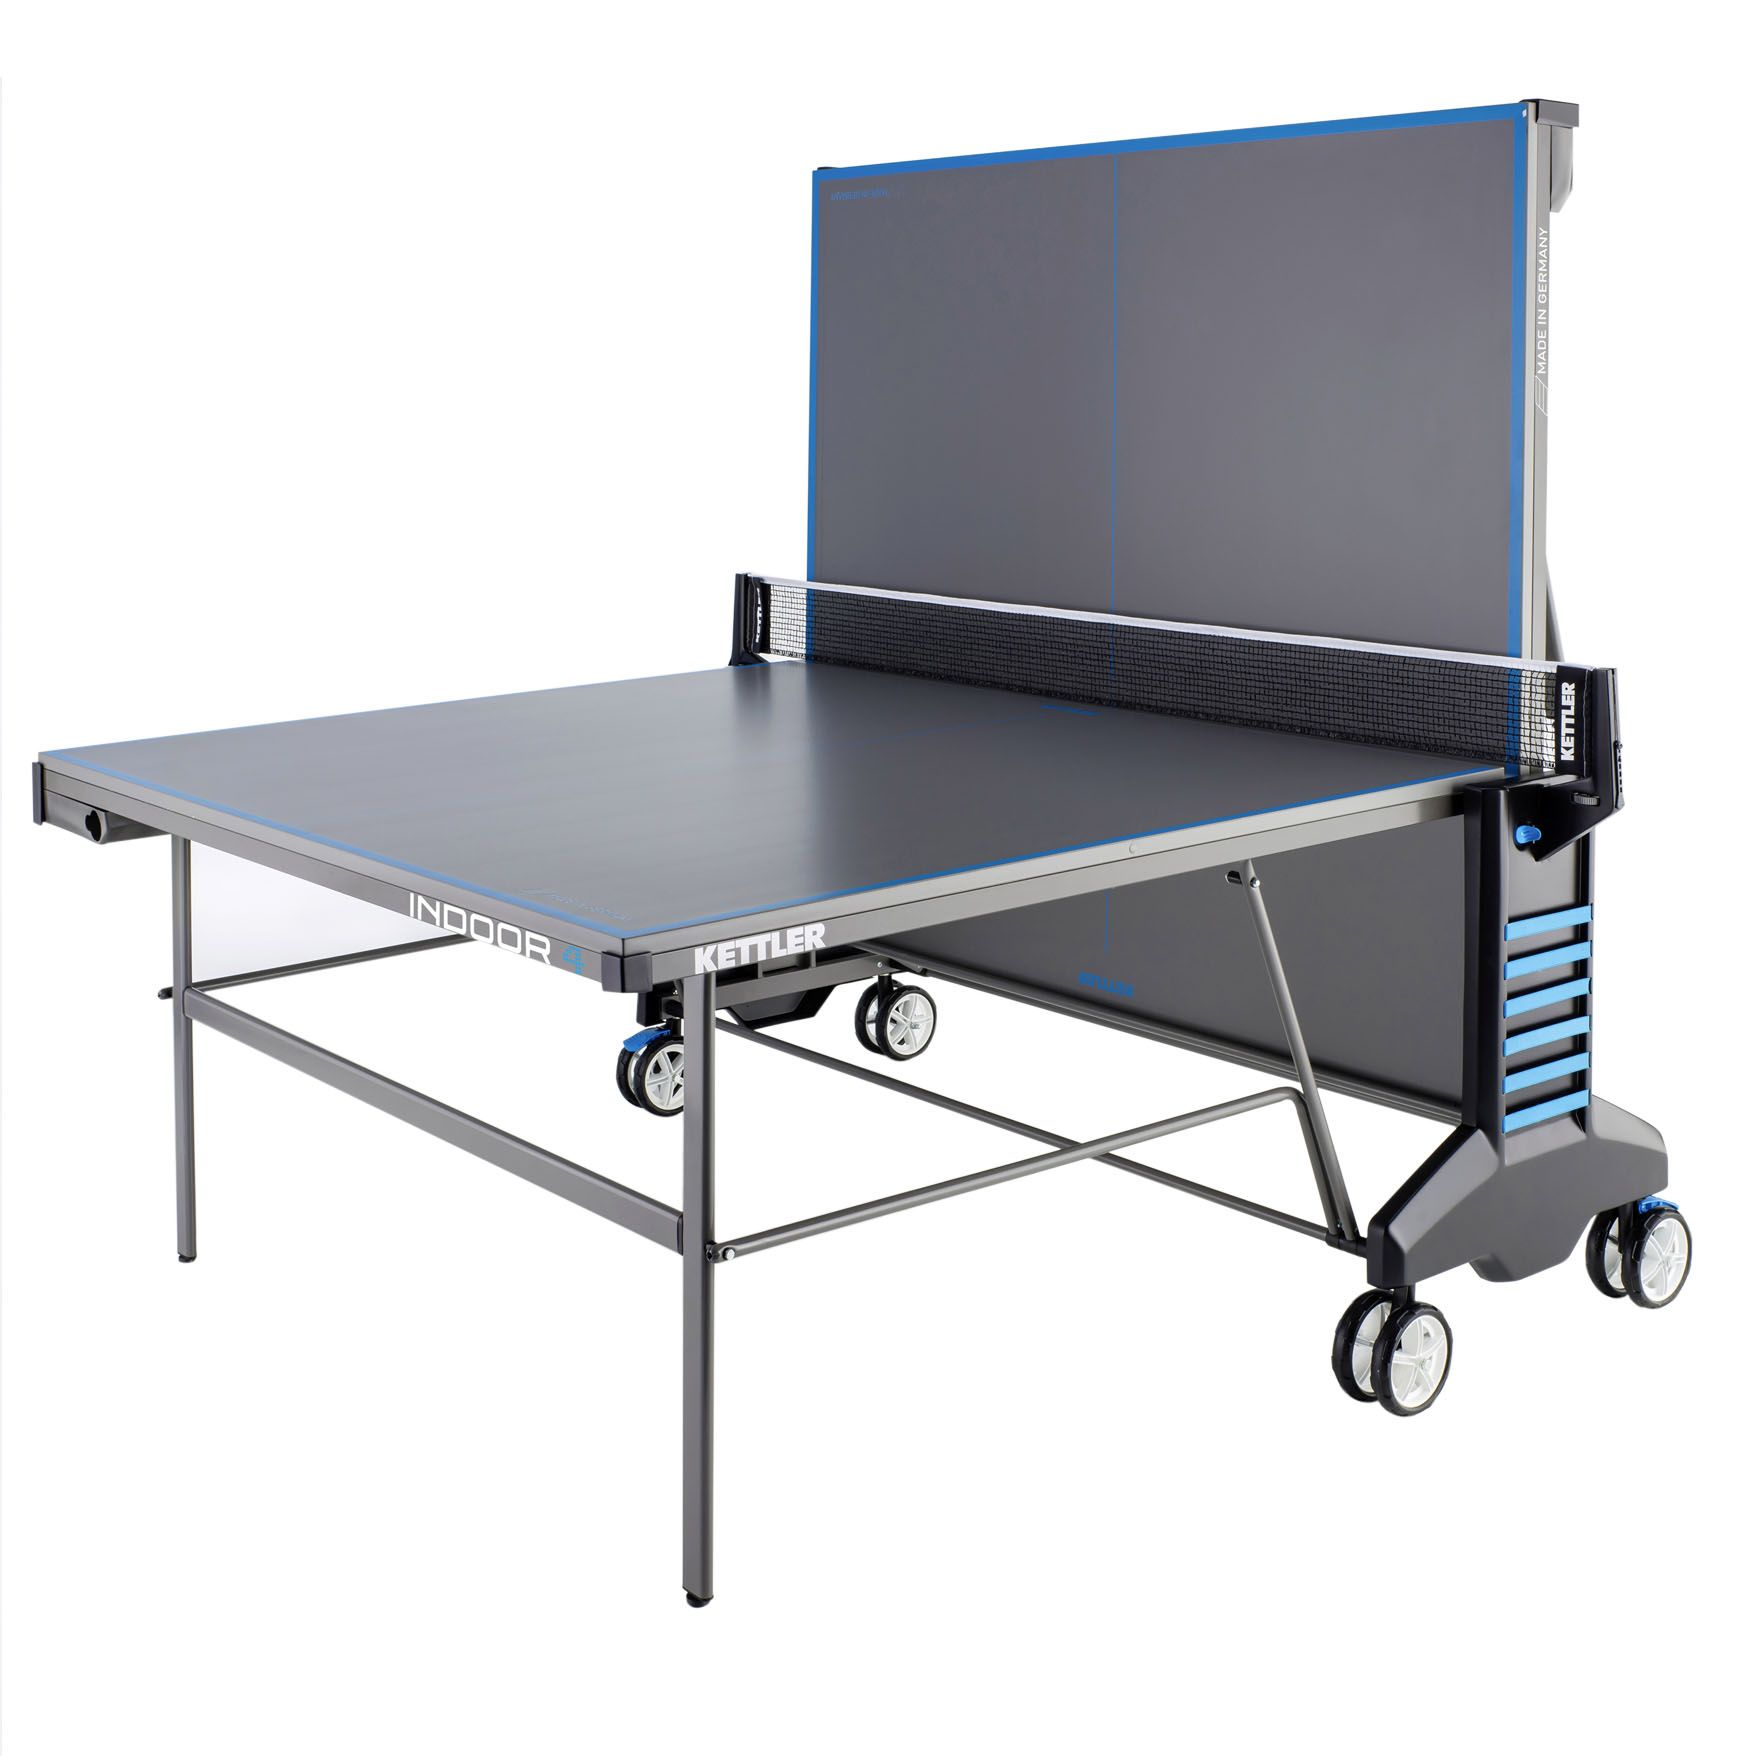 kettler classic indoor 4 table tennis table. Black Bedroom Furniture Sets. Home Design Ideas